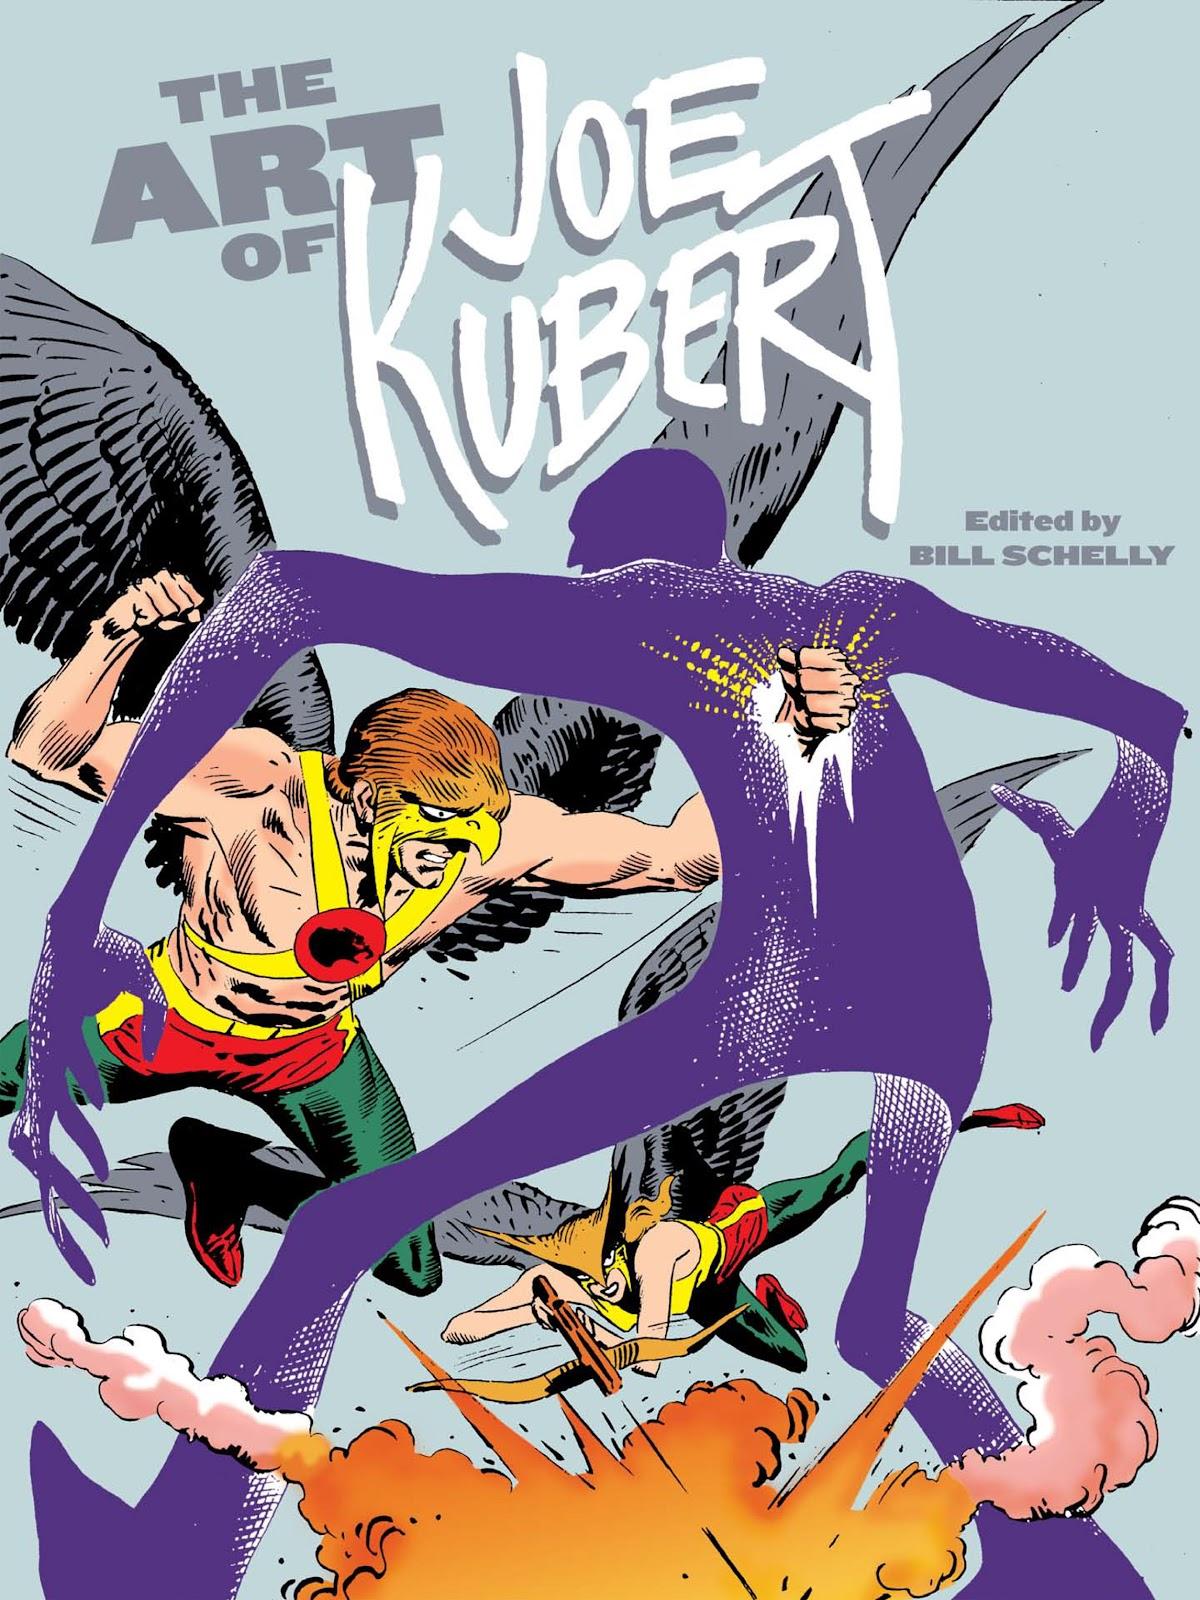 Read online The Art of Joe Kubert comic -  Issue # TPB (Part 1) - 1